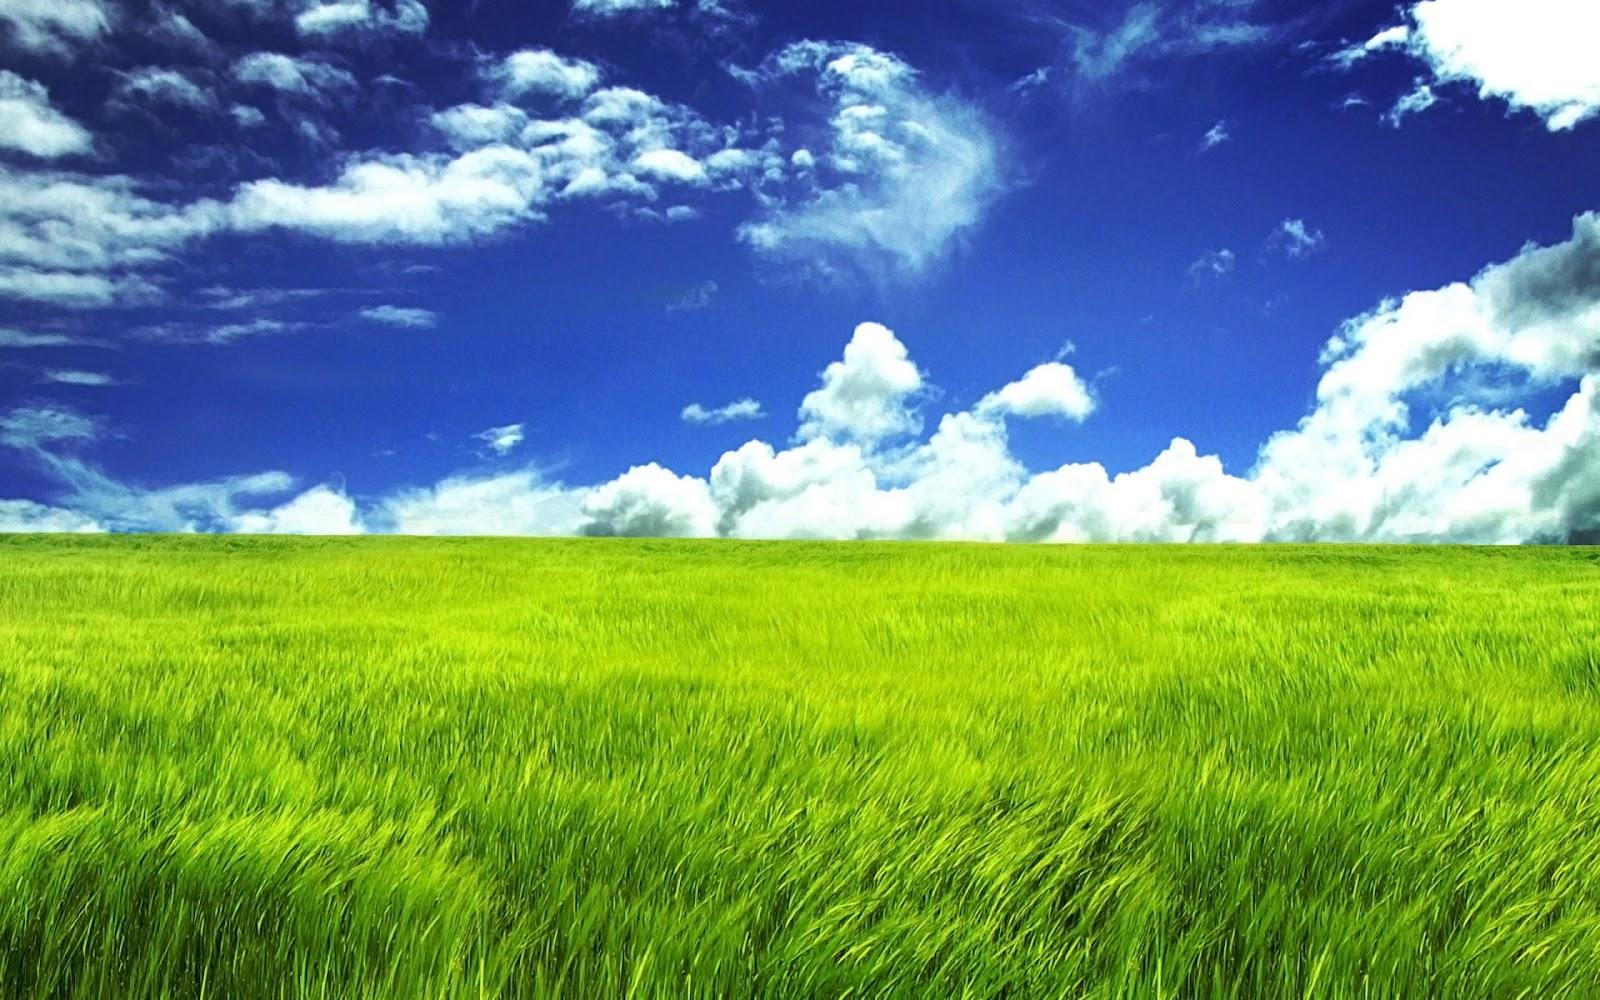 Beautiful HD Wallpapers Amazing Spring Grassland Desktop Wallpaper 1600x1000